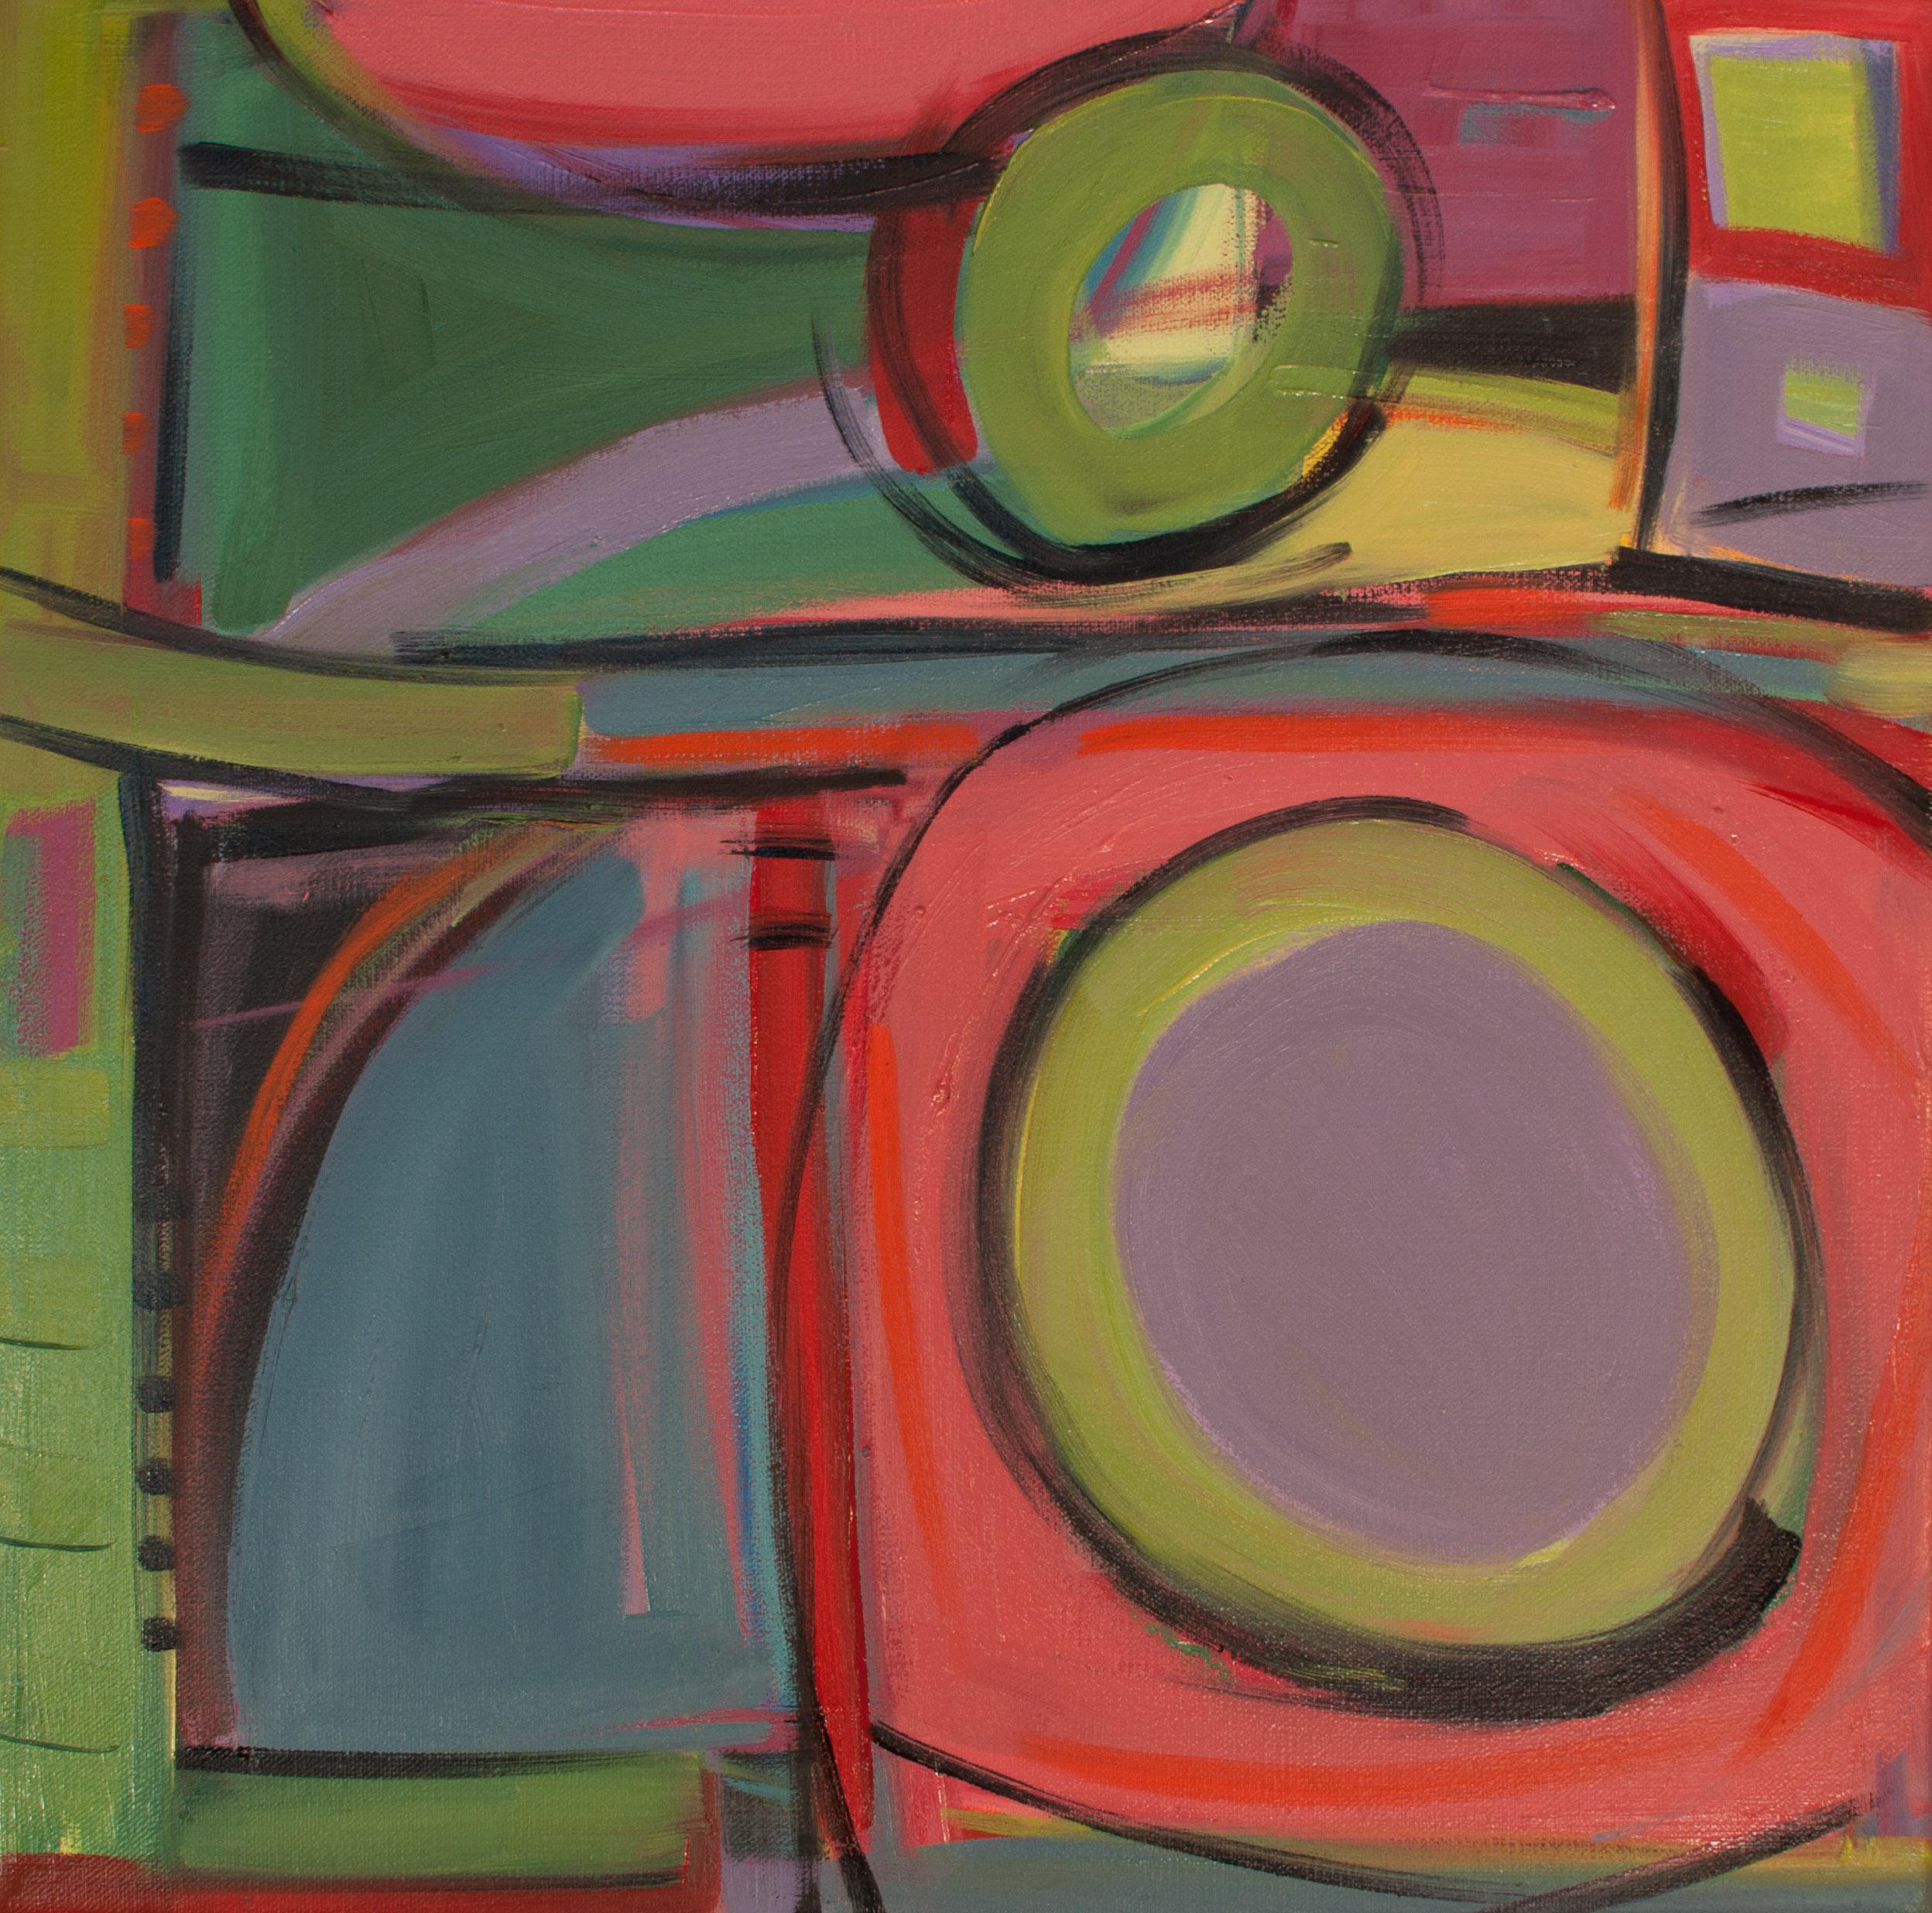 """Untitled"", 2012"